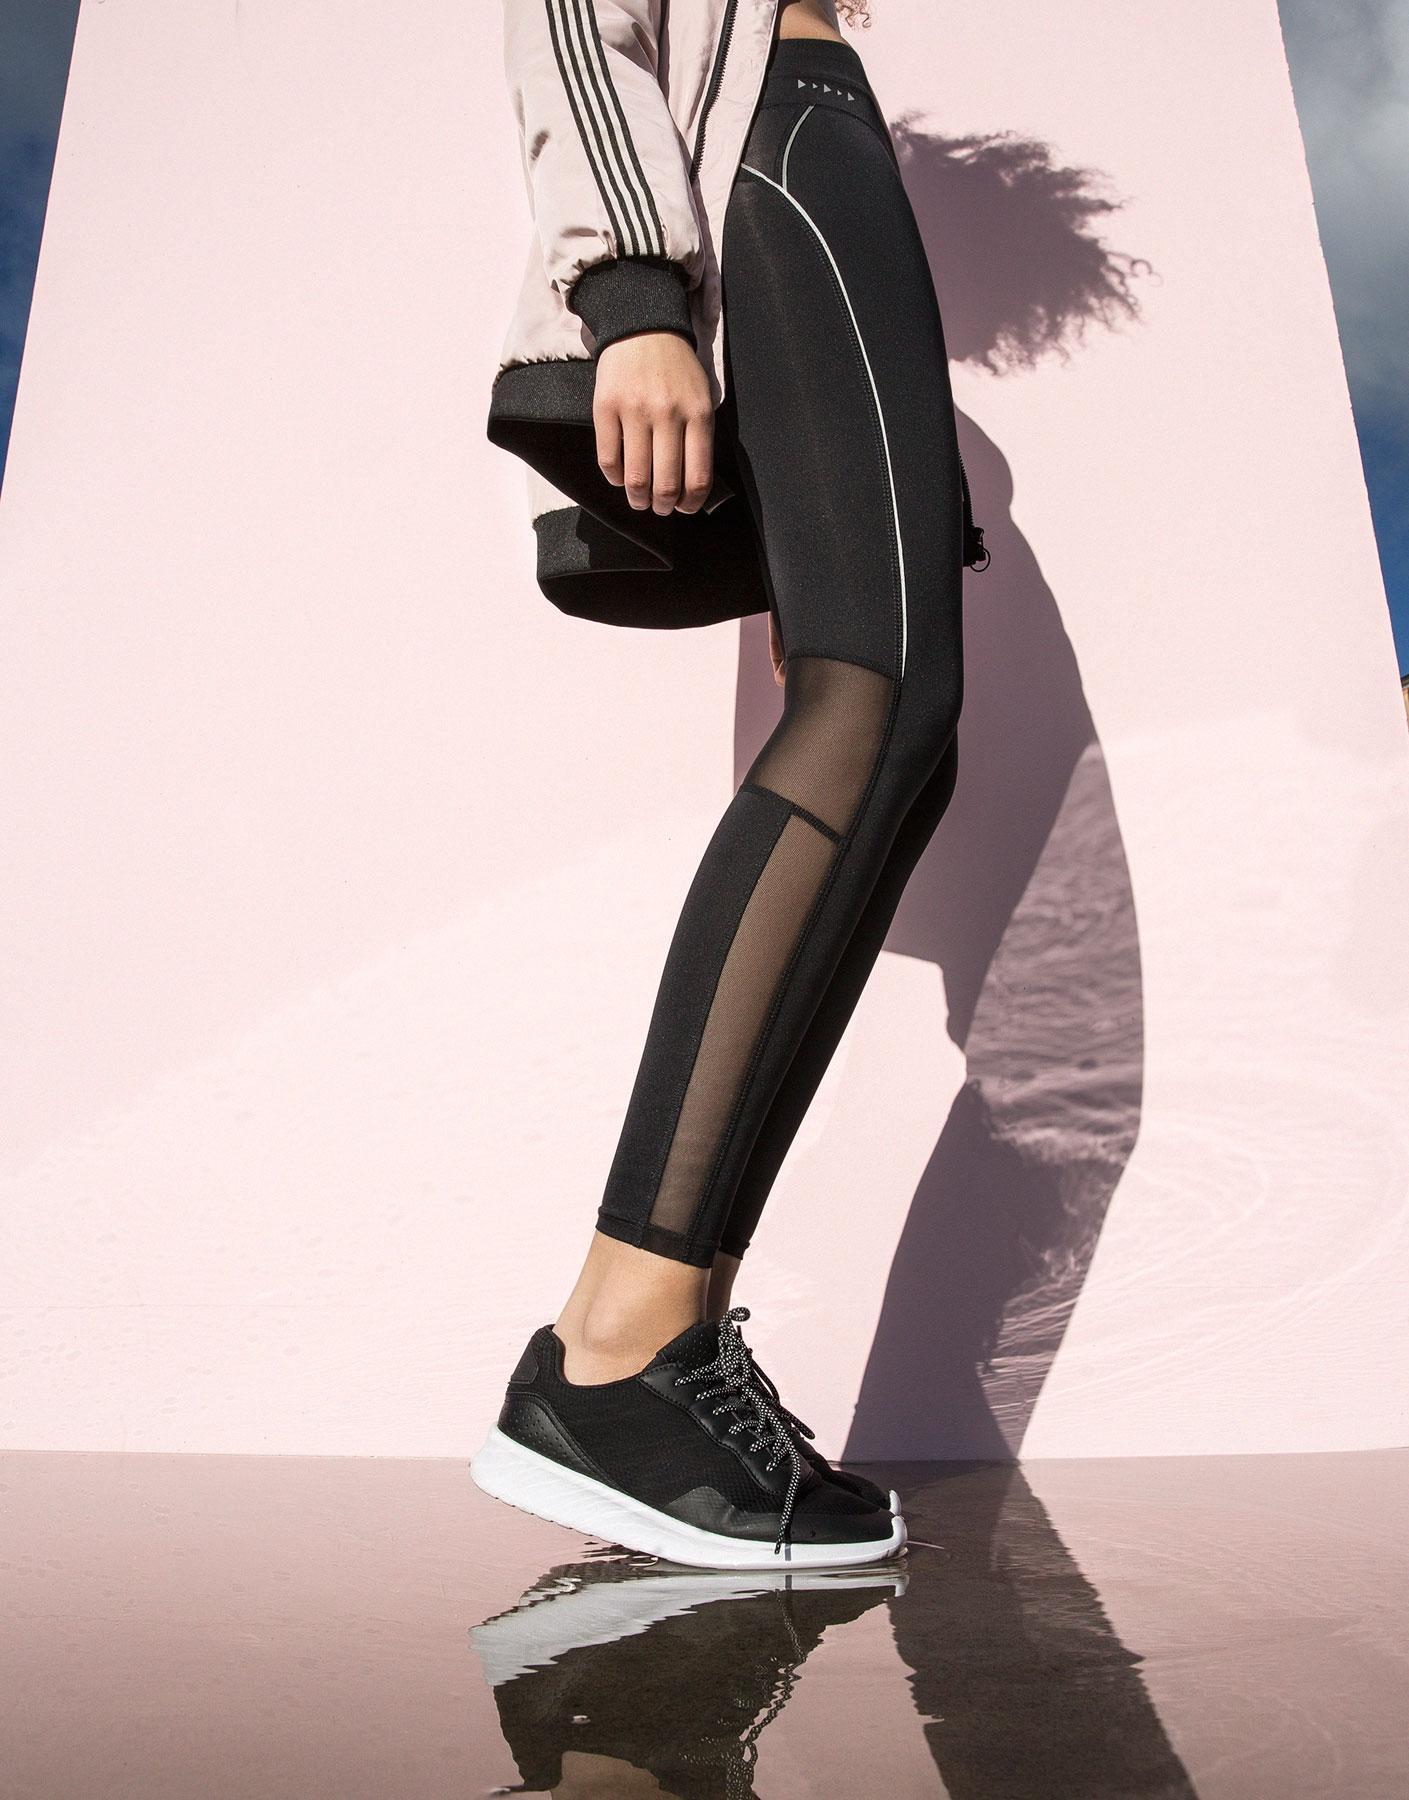 Long leggings for jogging